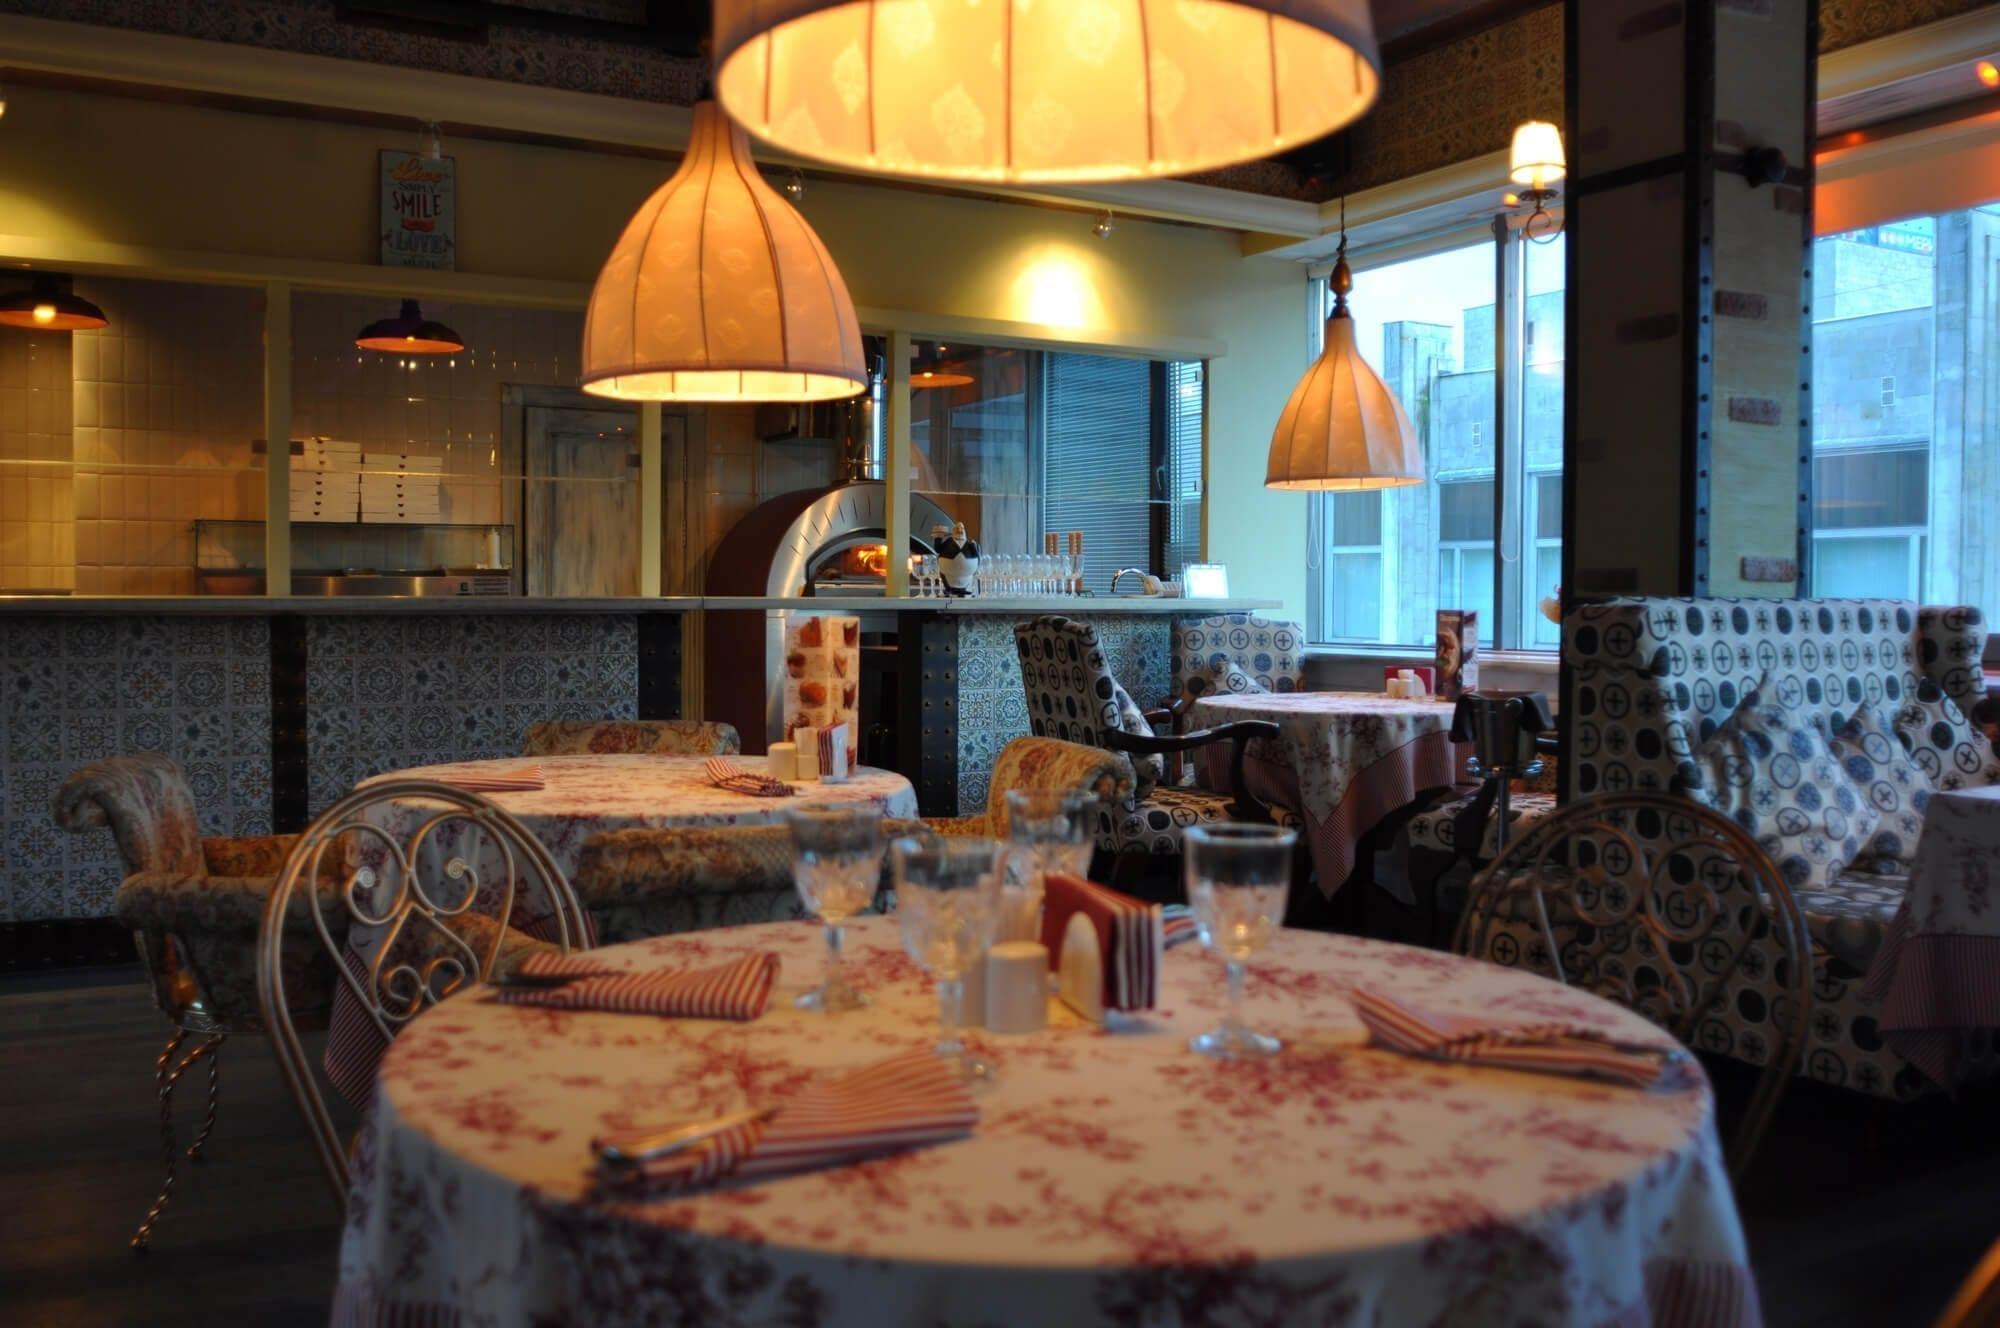 restaurant-cafe-61-mosca-1x-gallery-img-2016-10-12-14-01-17